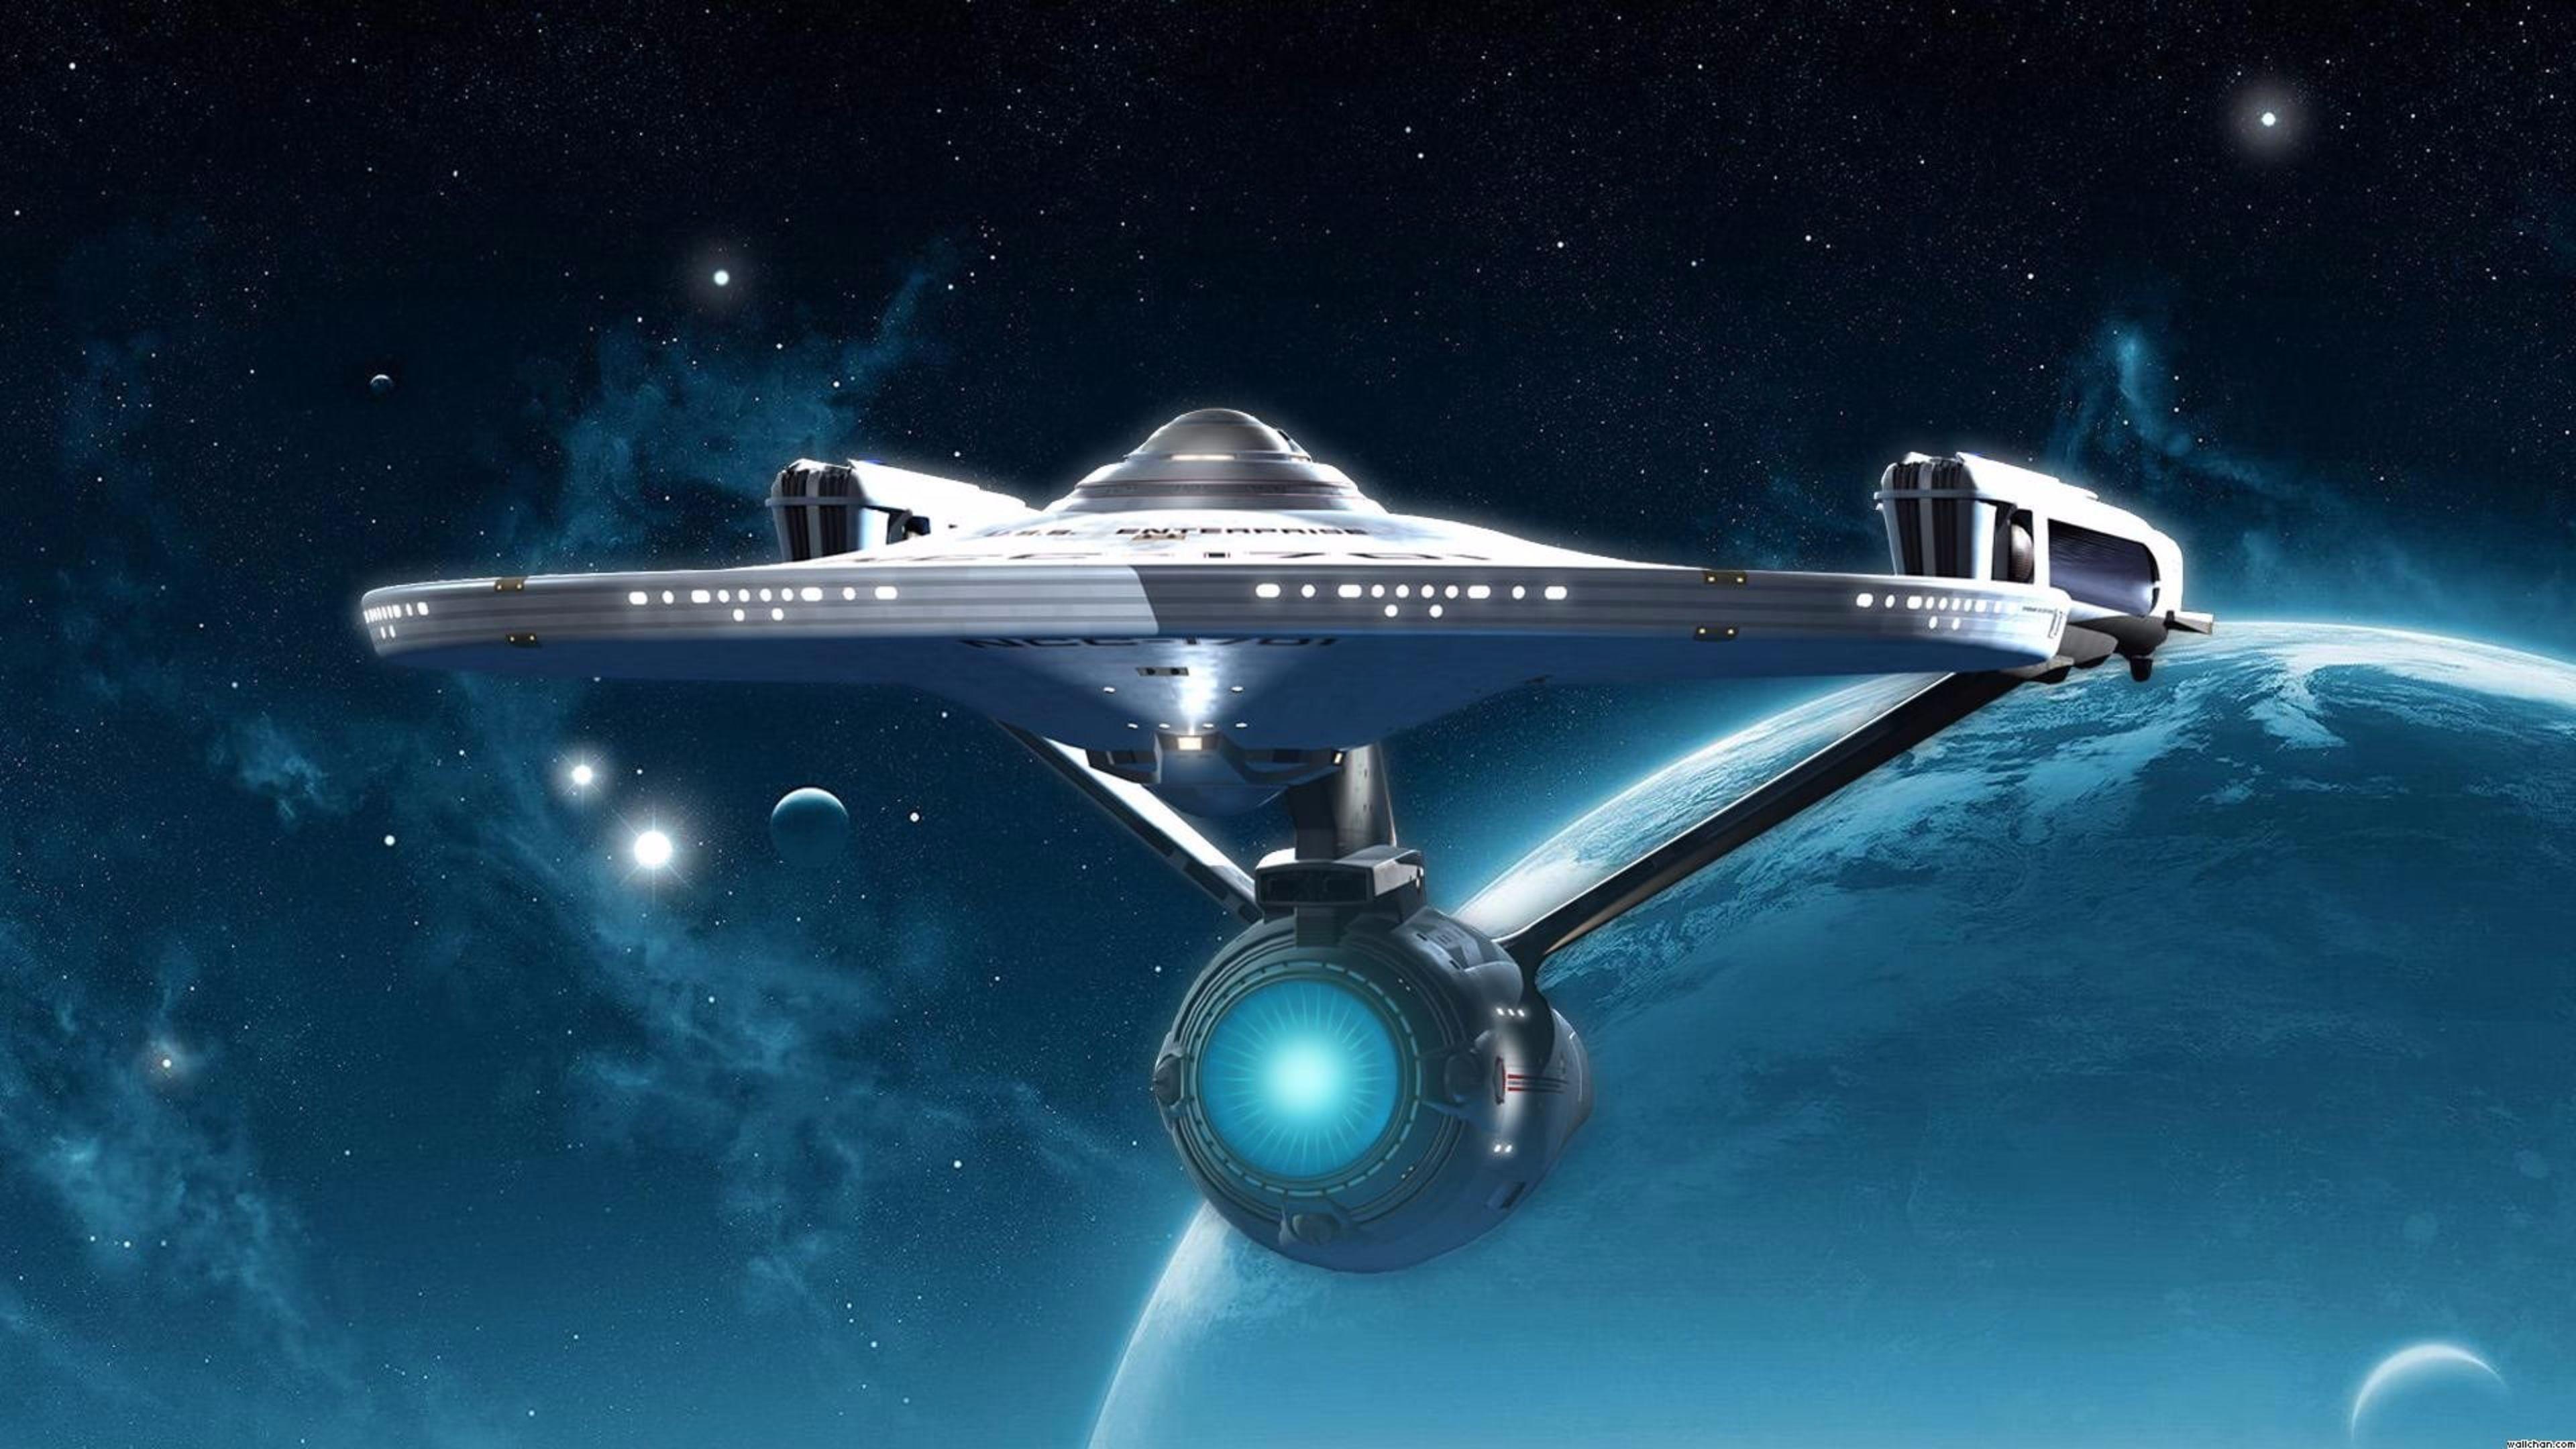 Star Trek 4k Wallpapers Top Free Star Trek 4k Backgrounds